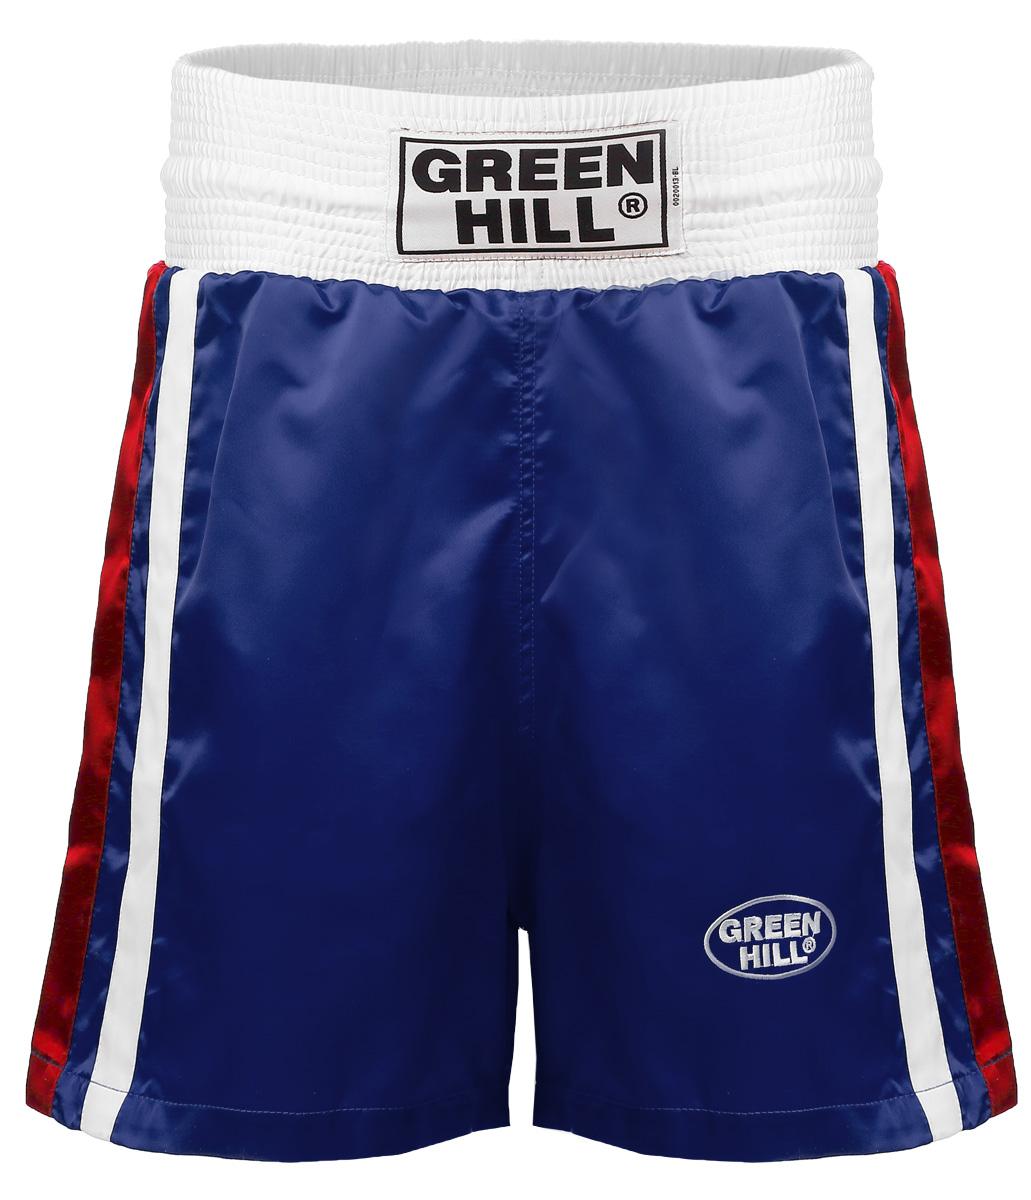 Трусы боксерские GREEN HILL OLIMPIC, цвет: синий. BSO-6320. Размер XS (44) трусы dressed in green трусы